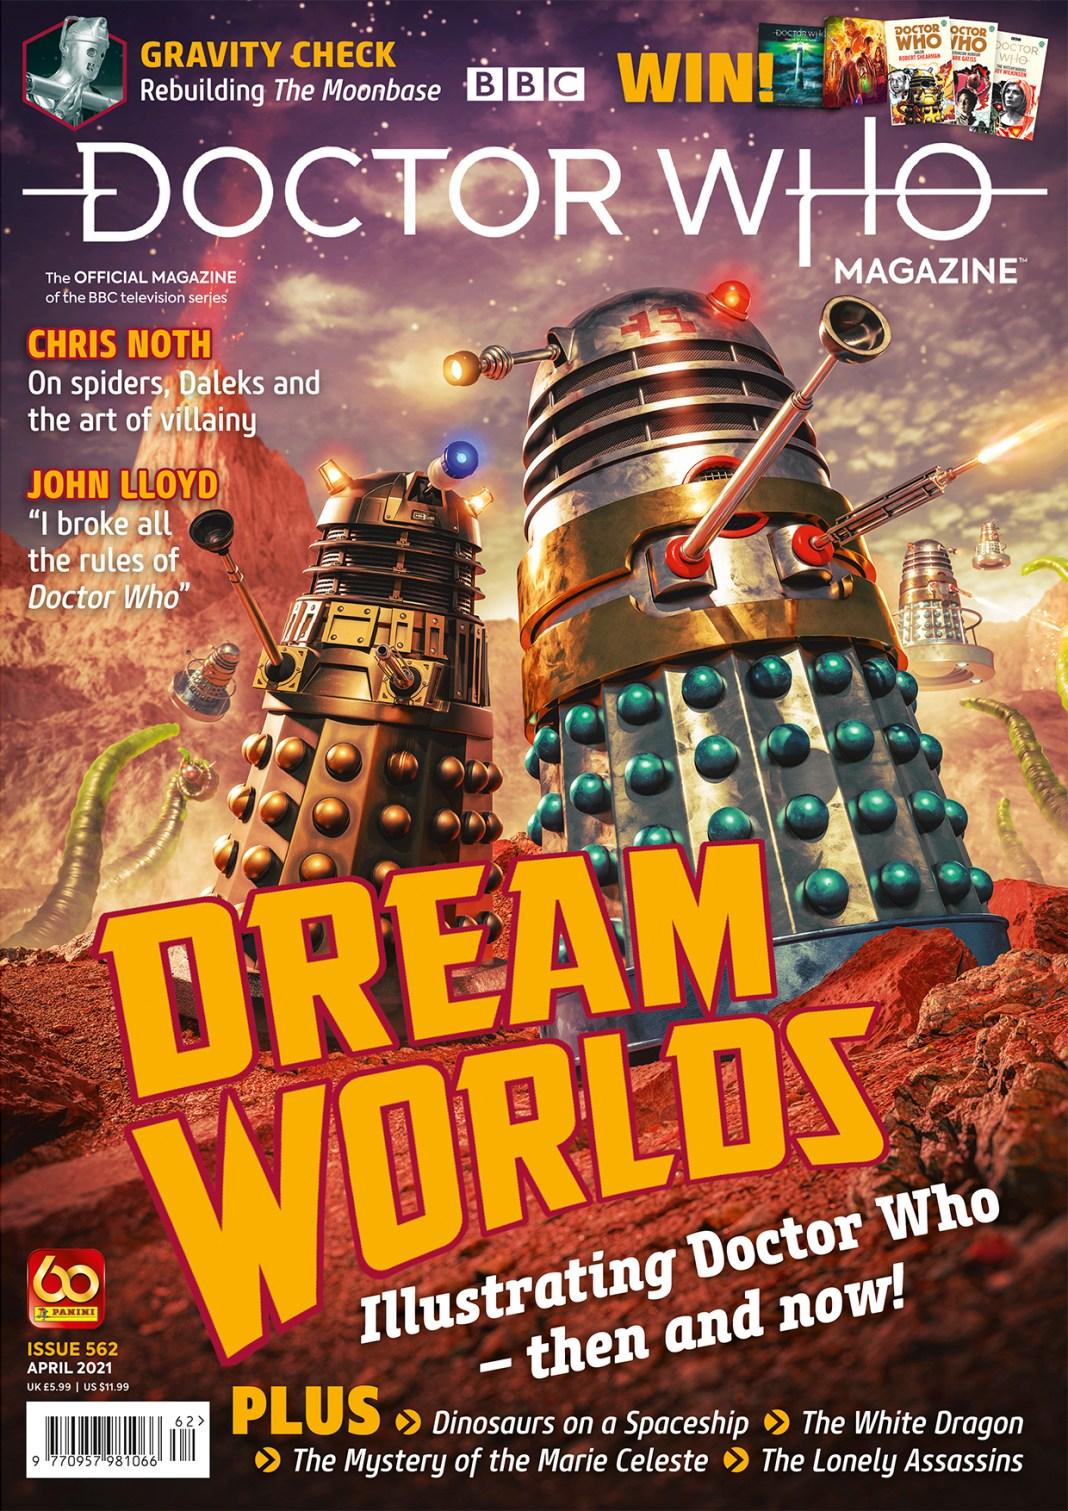 Doctor Who Magazine 562. Cover by Anthony Lamb (c) Panini Daleks Dalek Book Doctor Who art